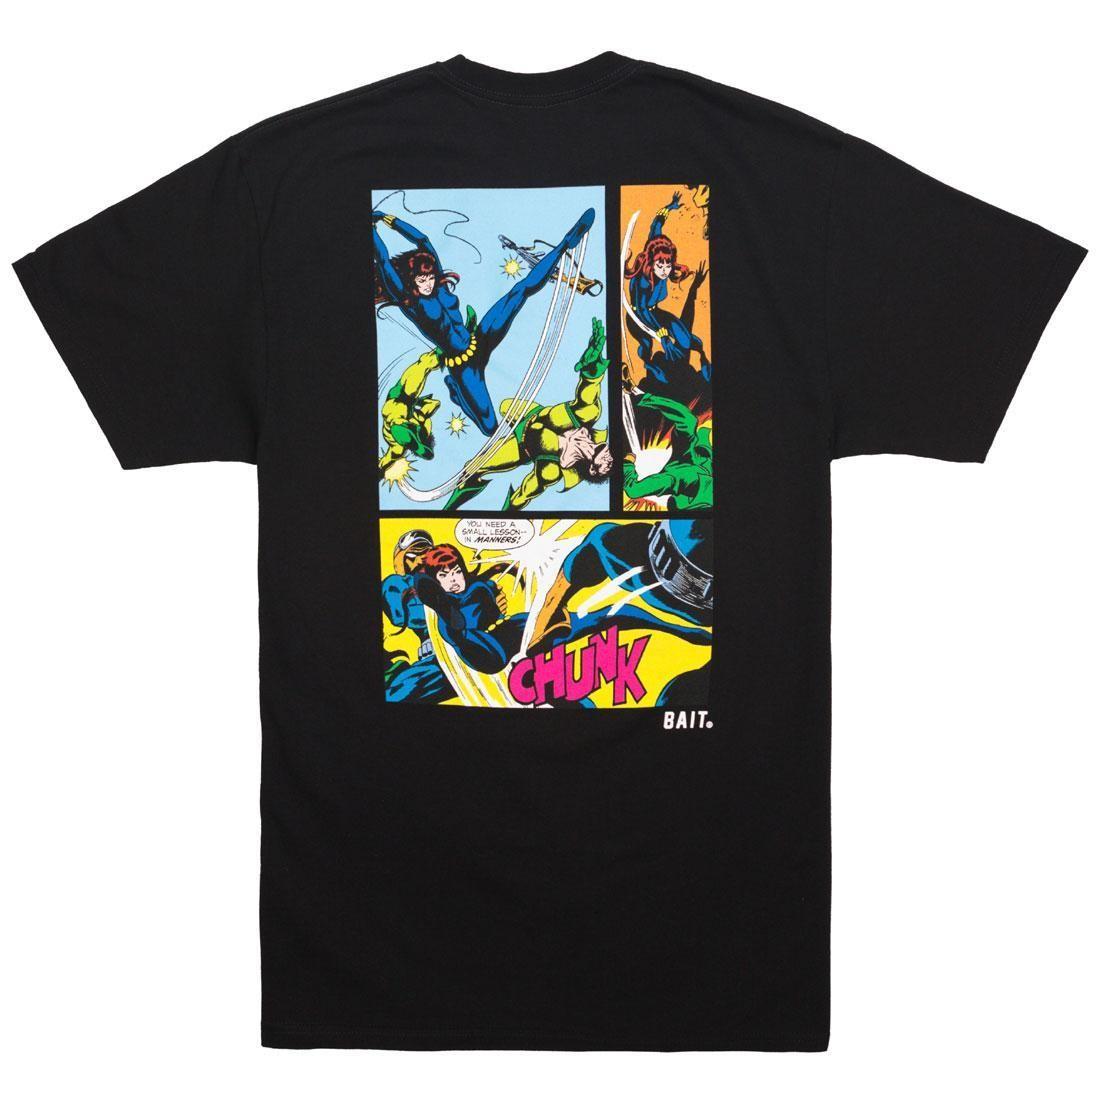 BAIT x Marvel Comics Men Black Widow Tee (black)